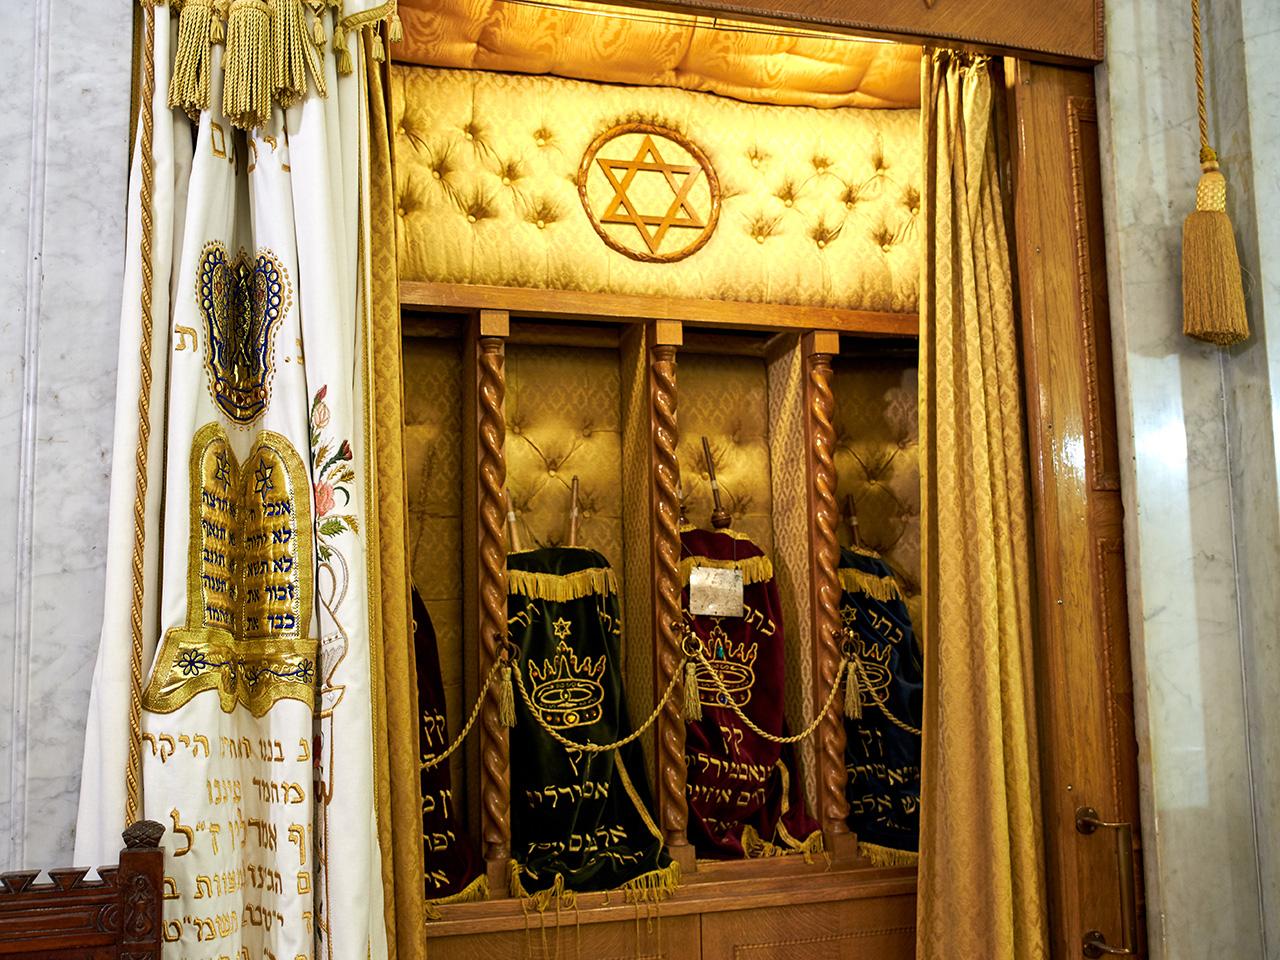 Thessaloniki Monastirioton Synagogue - Greek Jewish tours - Jewish Greek travel packages - Atlantis Travel Agency Greece - Thessaloniki Jewish tour - Jewish tour of Thessaloniki Greece